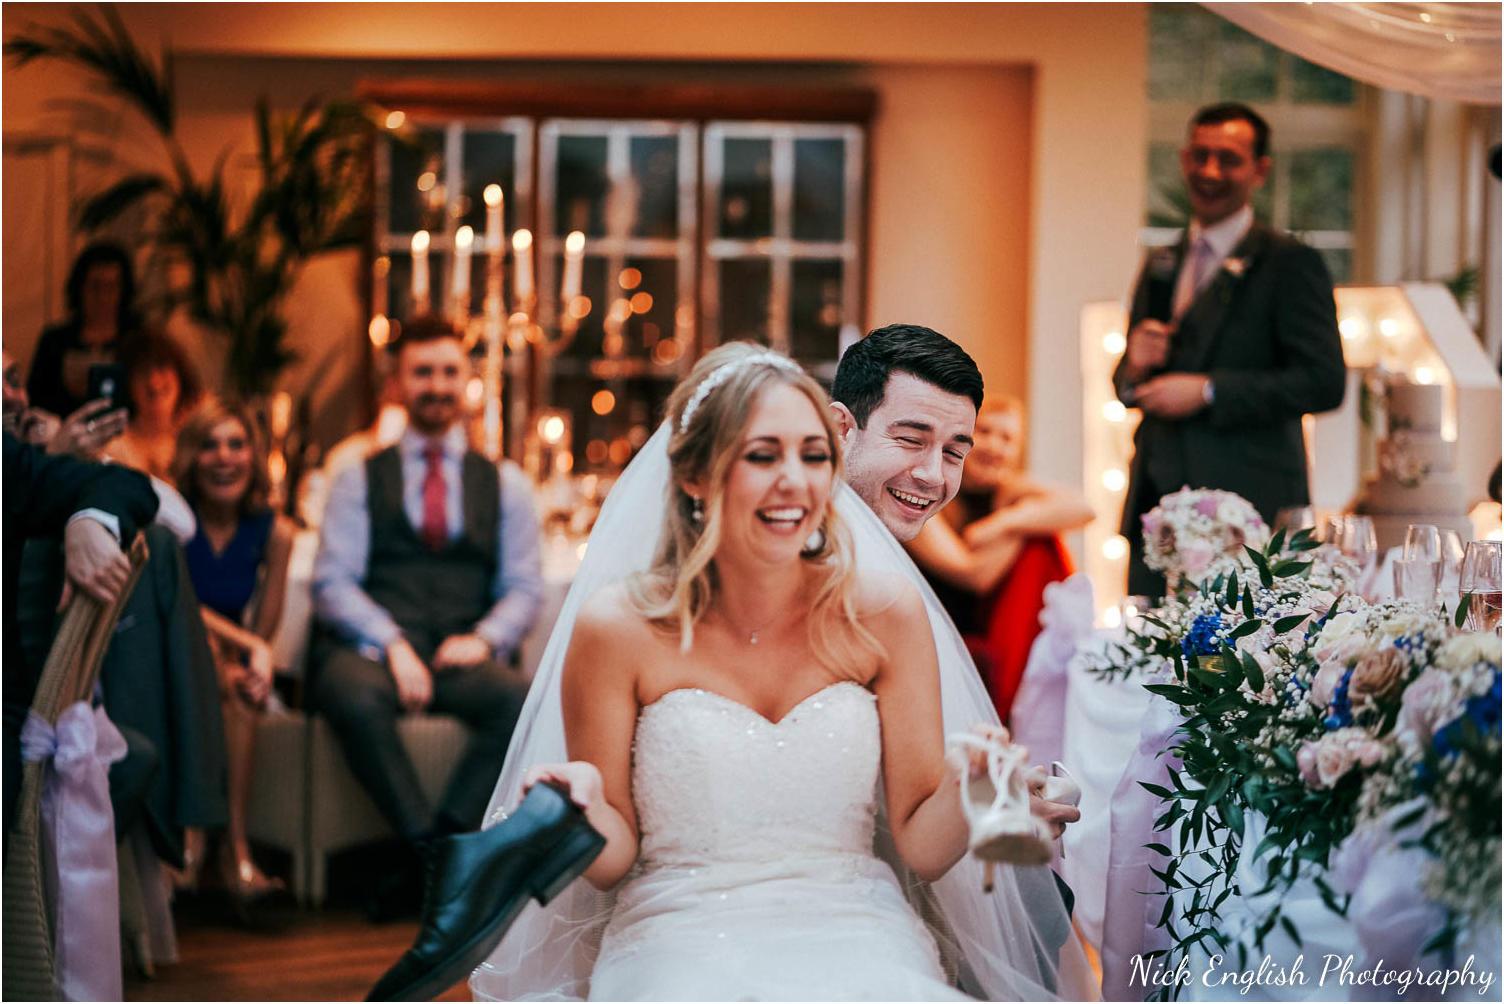 Mitton_Hall_Wedding_Photographer_2018-131.jpg